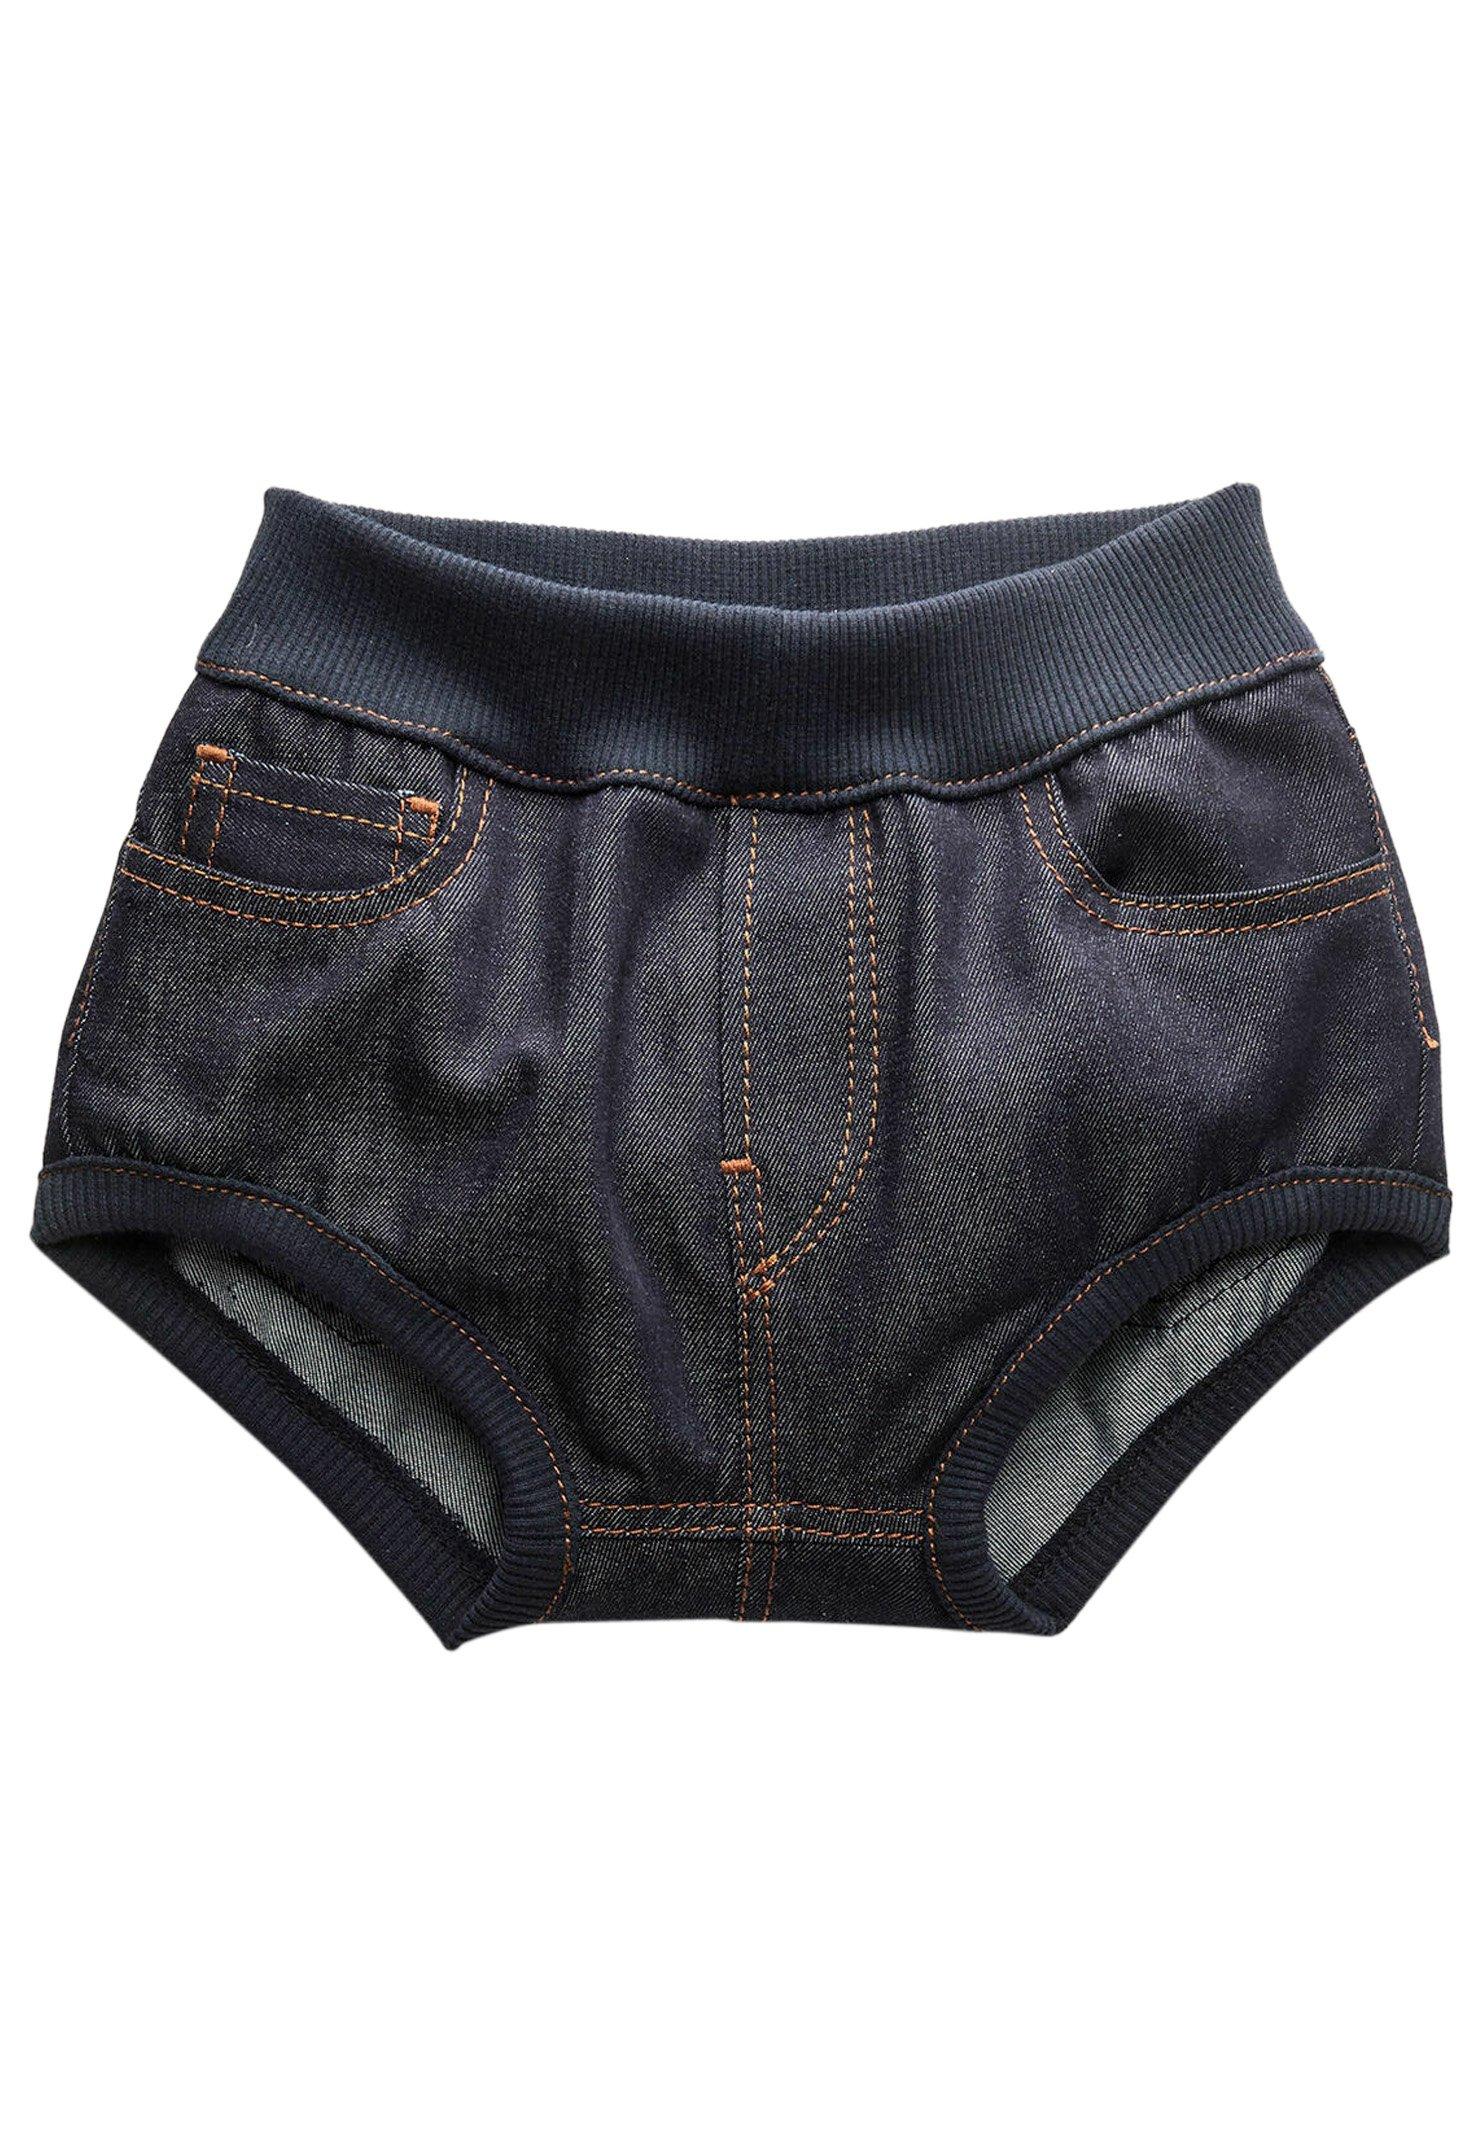 Kinder BB-G - Jeans Shorts